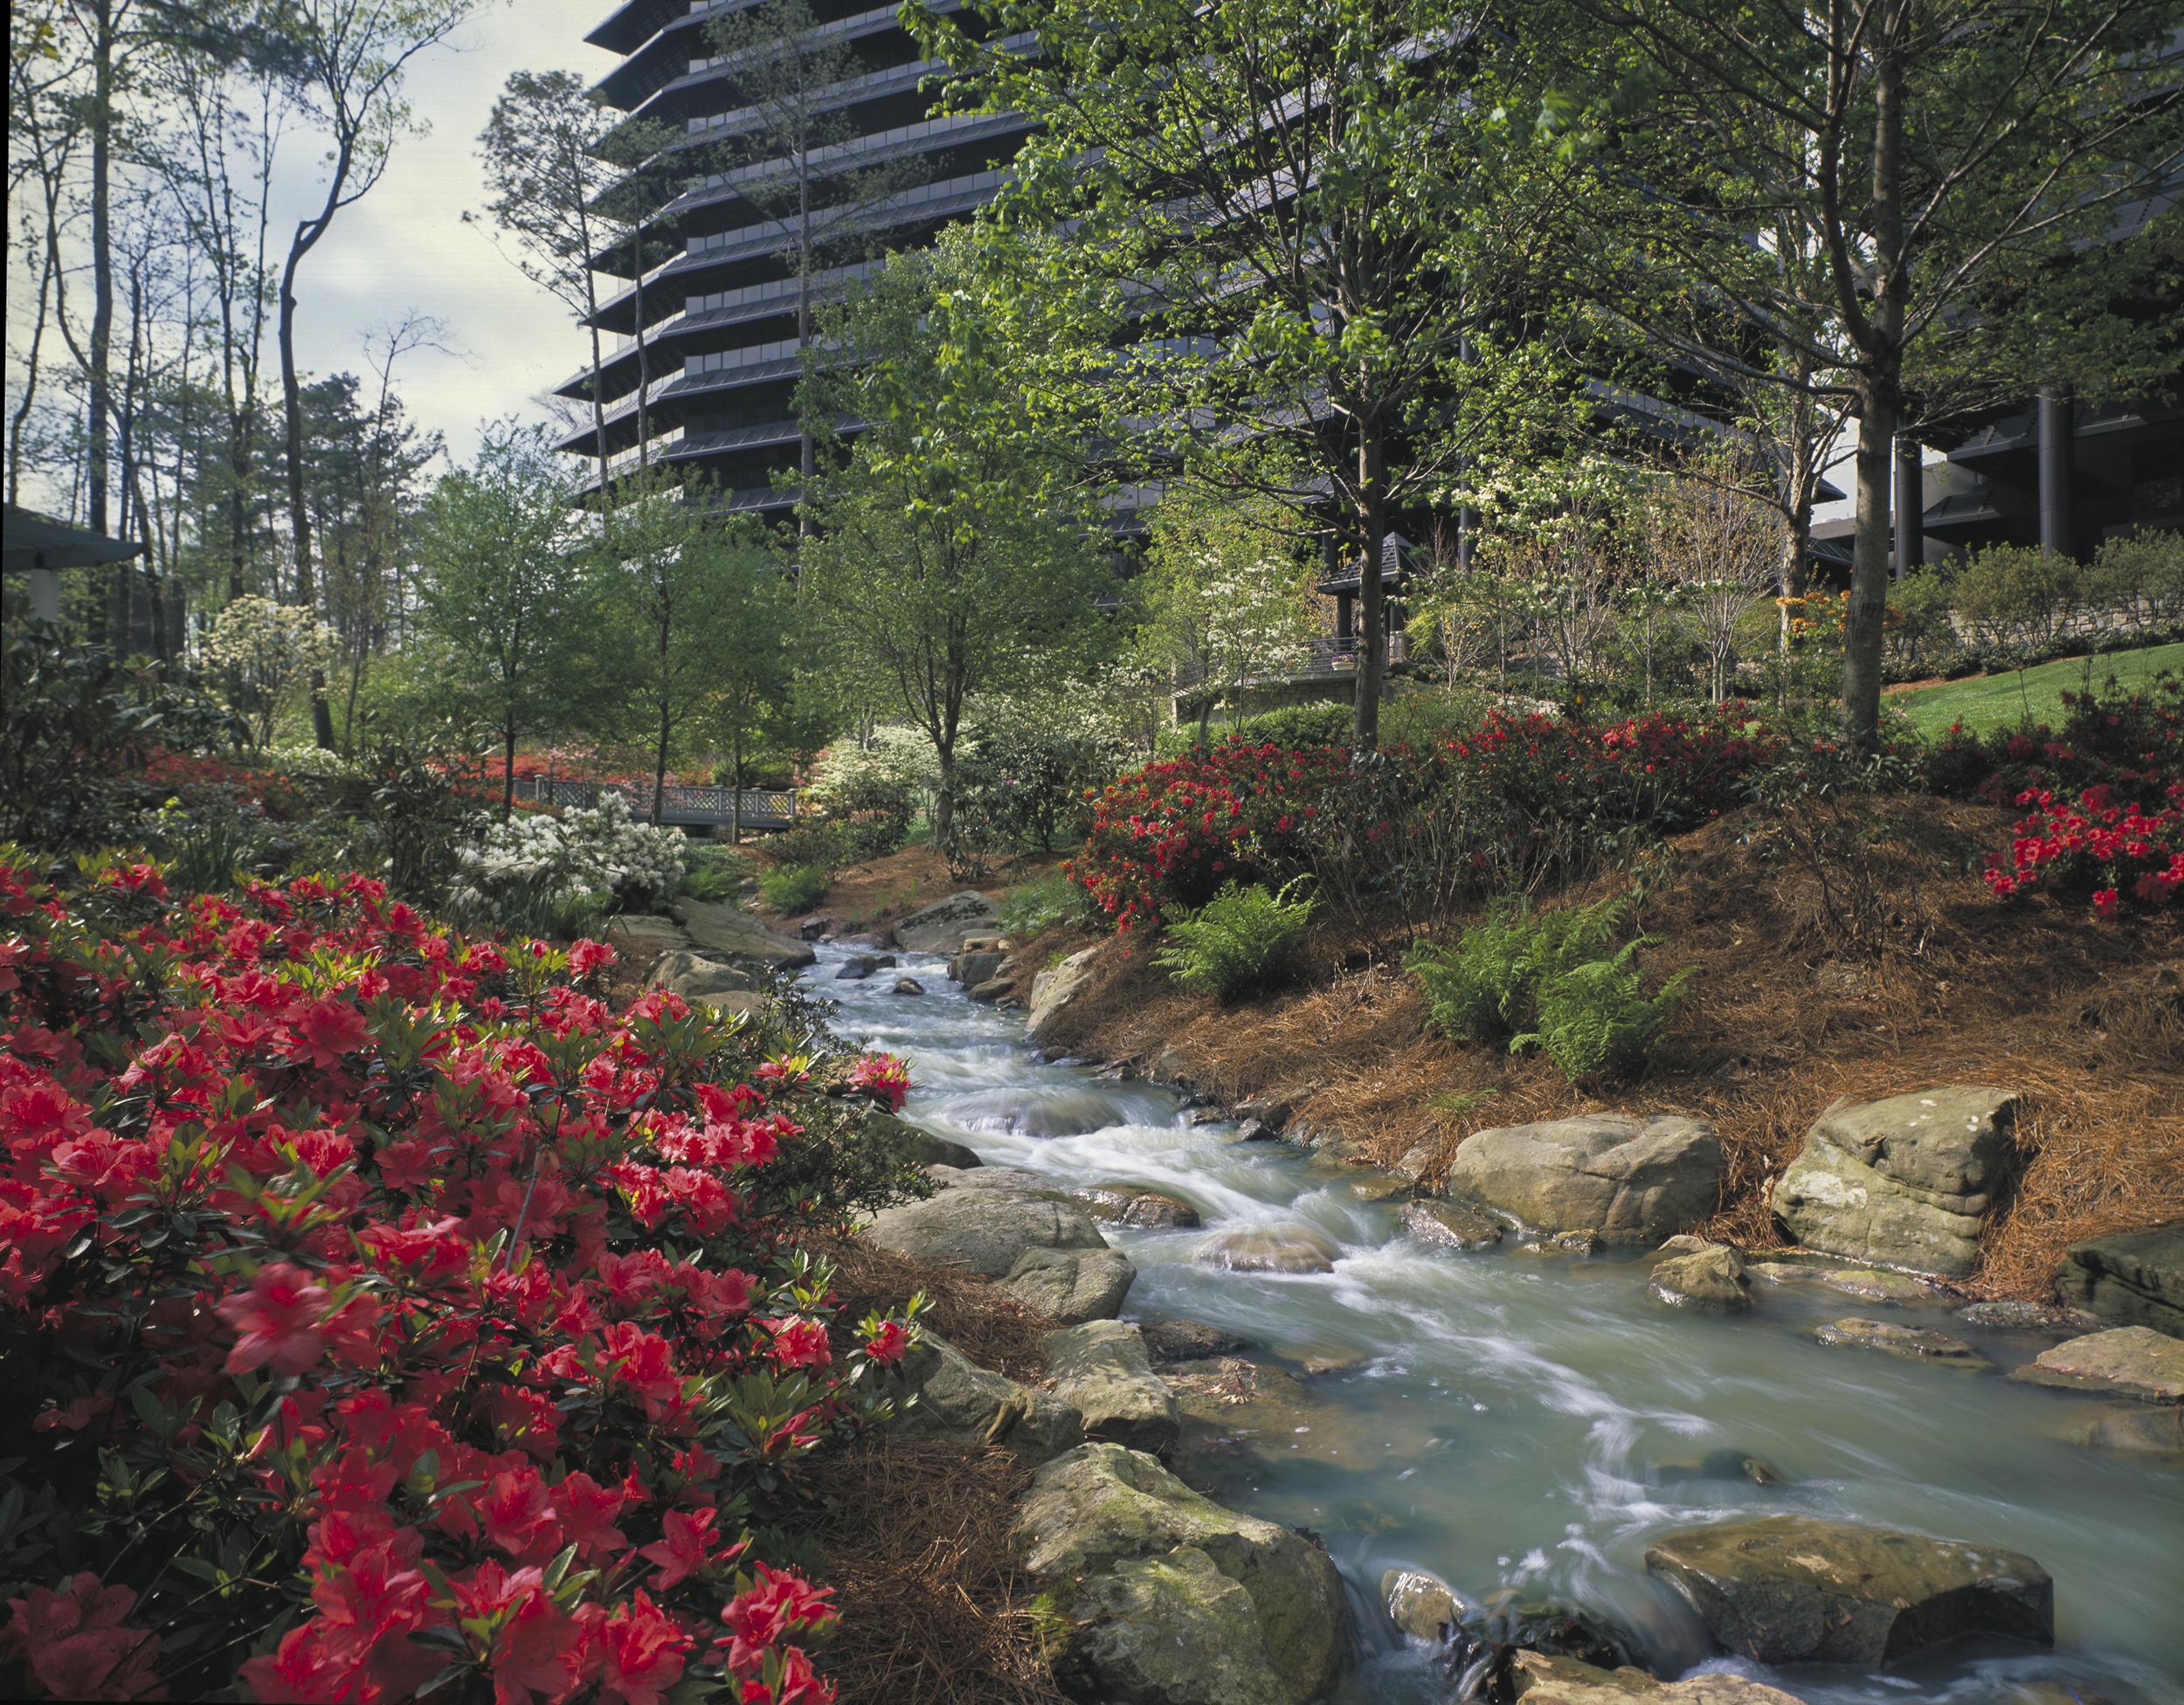 Three Ravinia Drive / MCI Office park, Atlanta, GA, USA.  Architect Kevin Roche, John Dinkeloo & Associates. Copyright © Kipp Baker, All rights reserved.